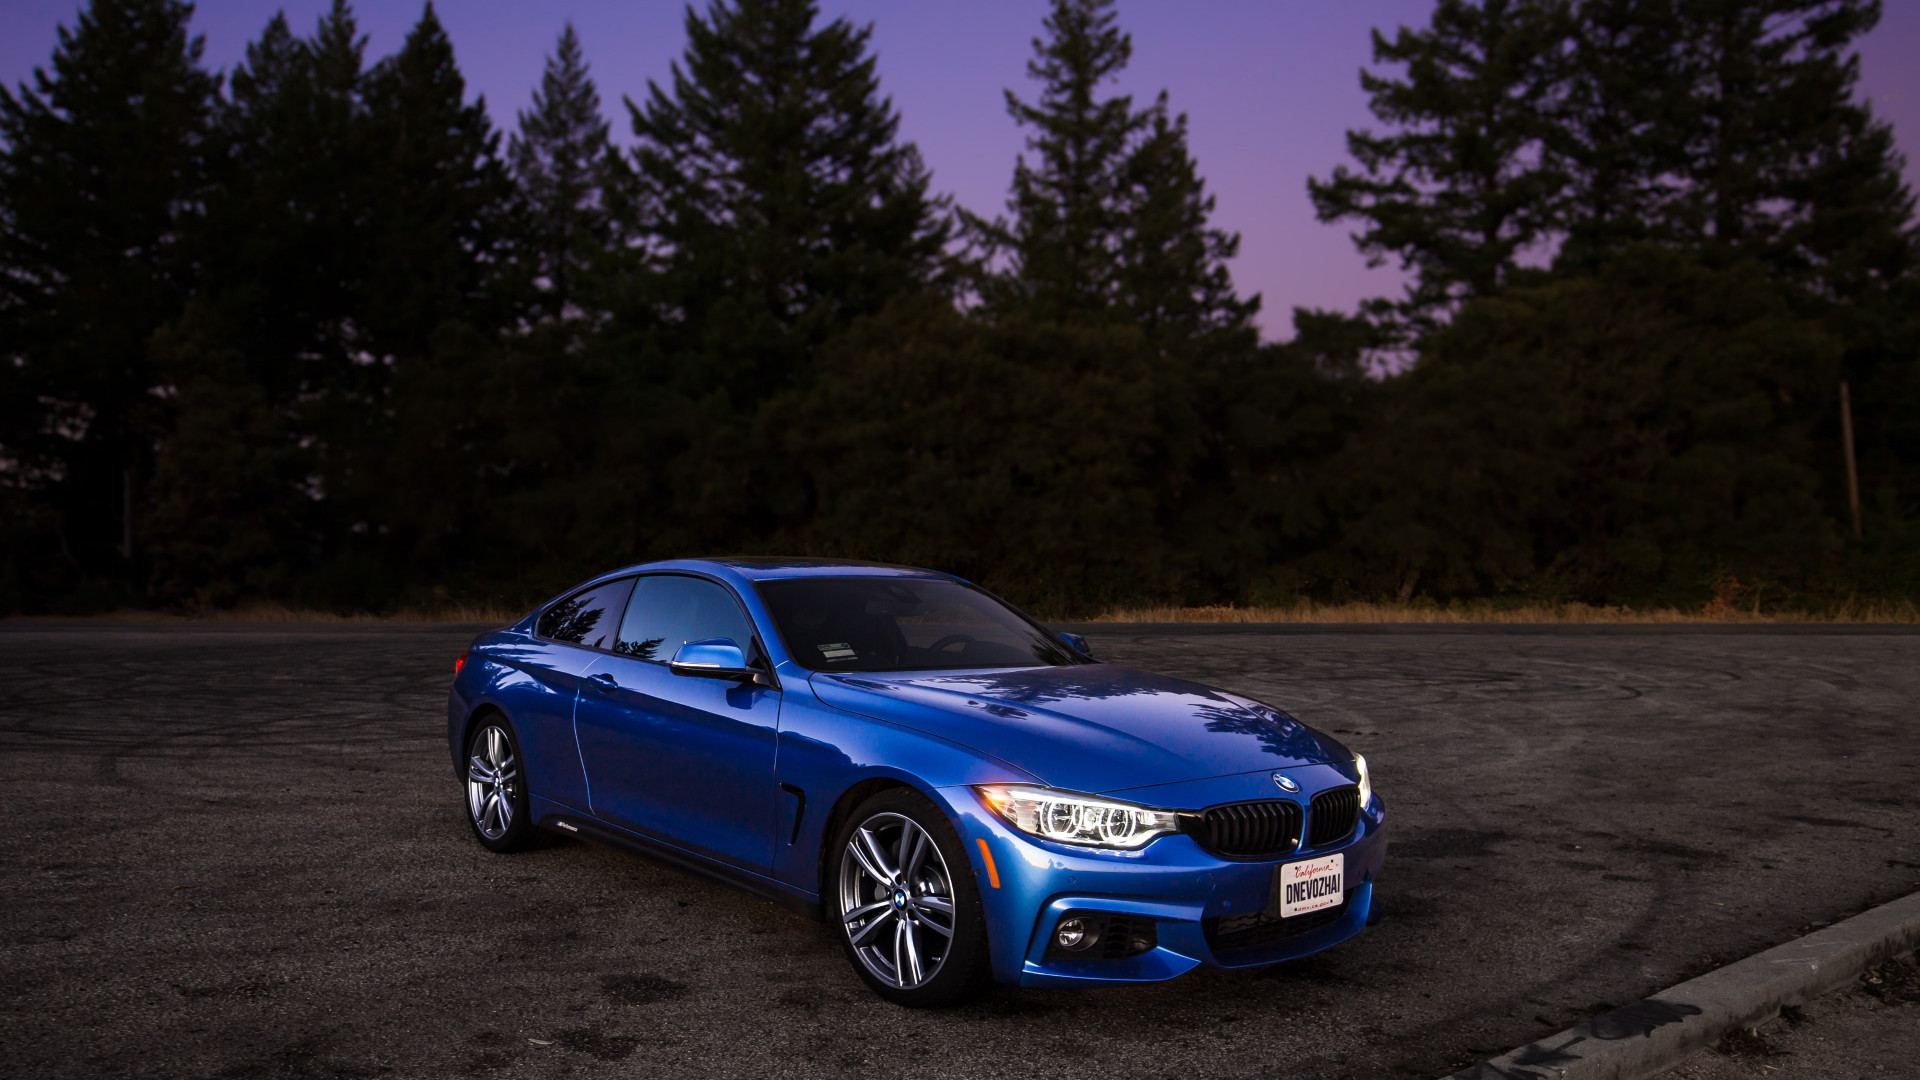 Download wallpaper: BMW 440i M 1920x1080